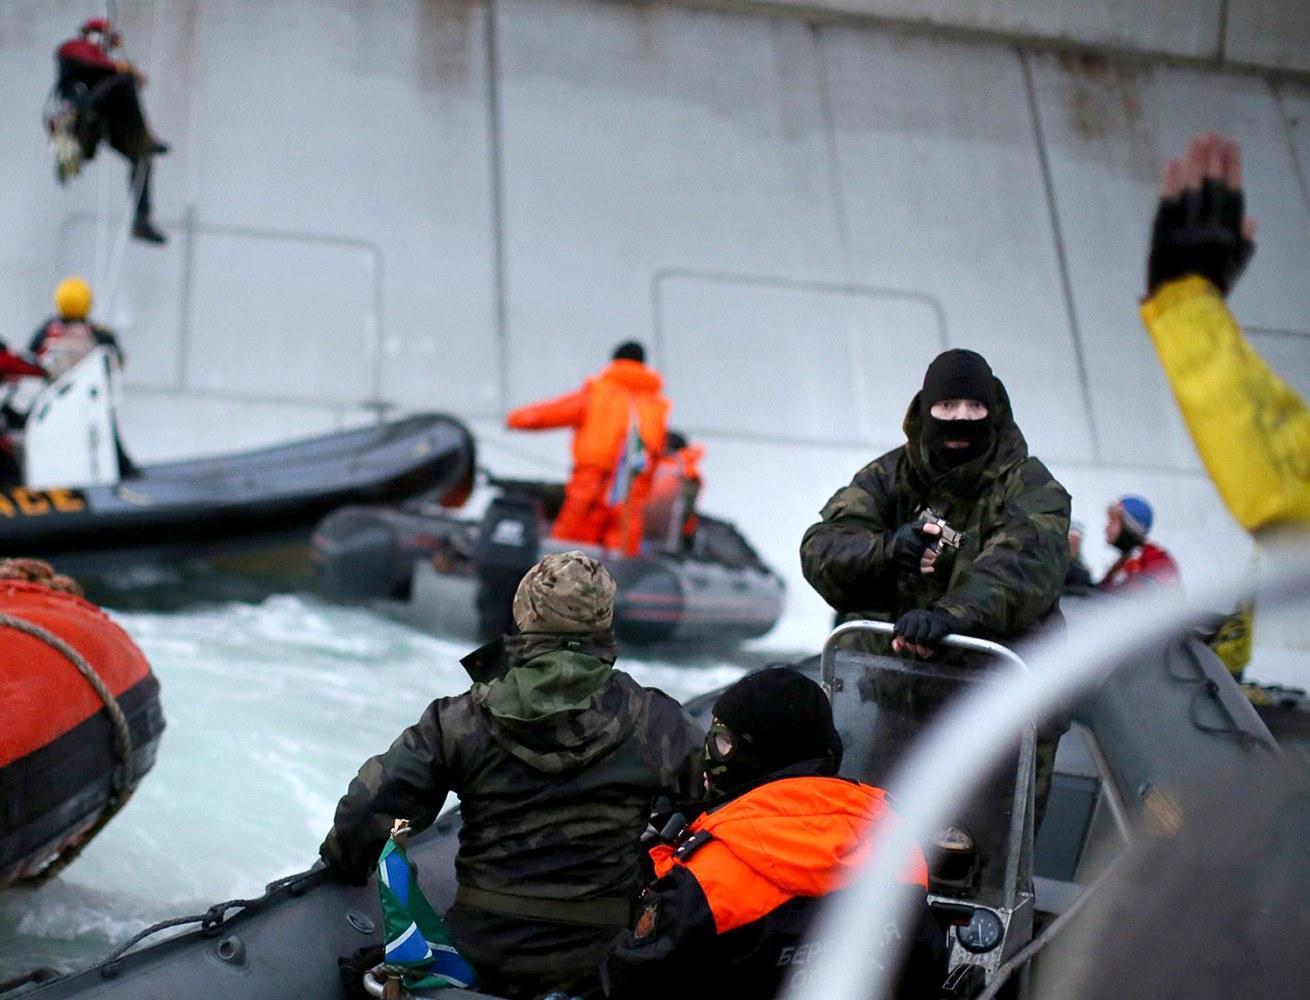 Greenpeace environmentalists remove gas from Gazprom's platform 24.08.2012 68